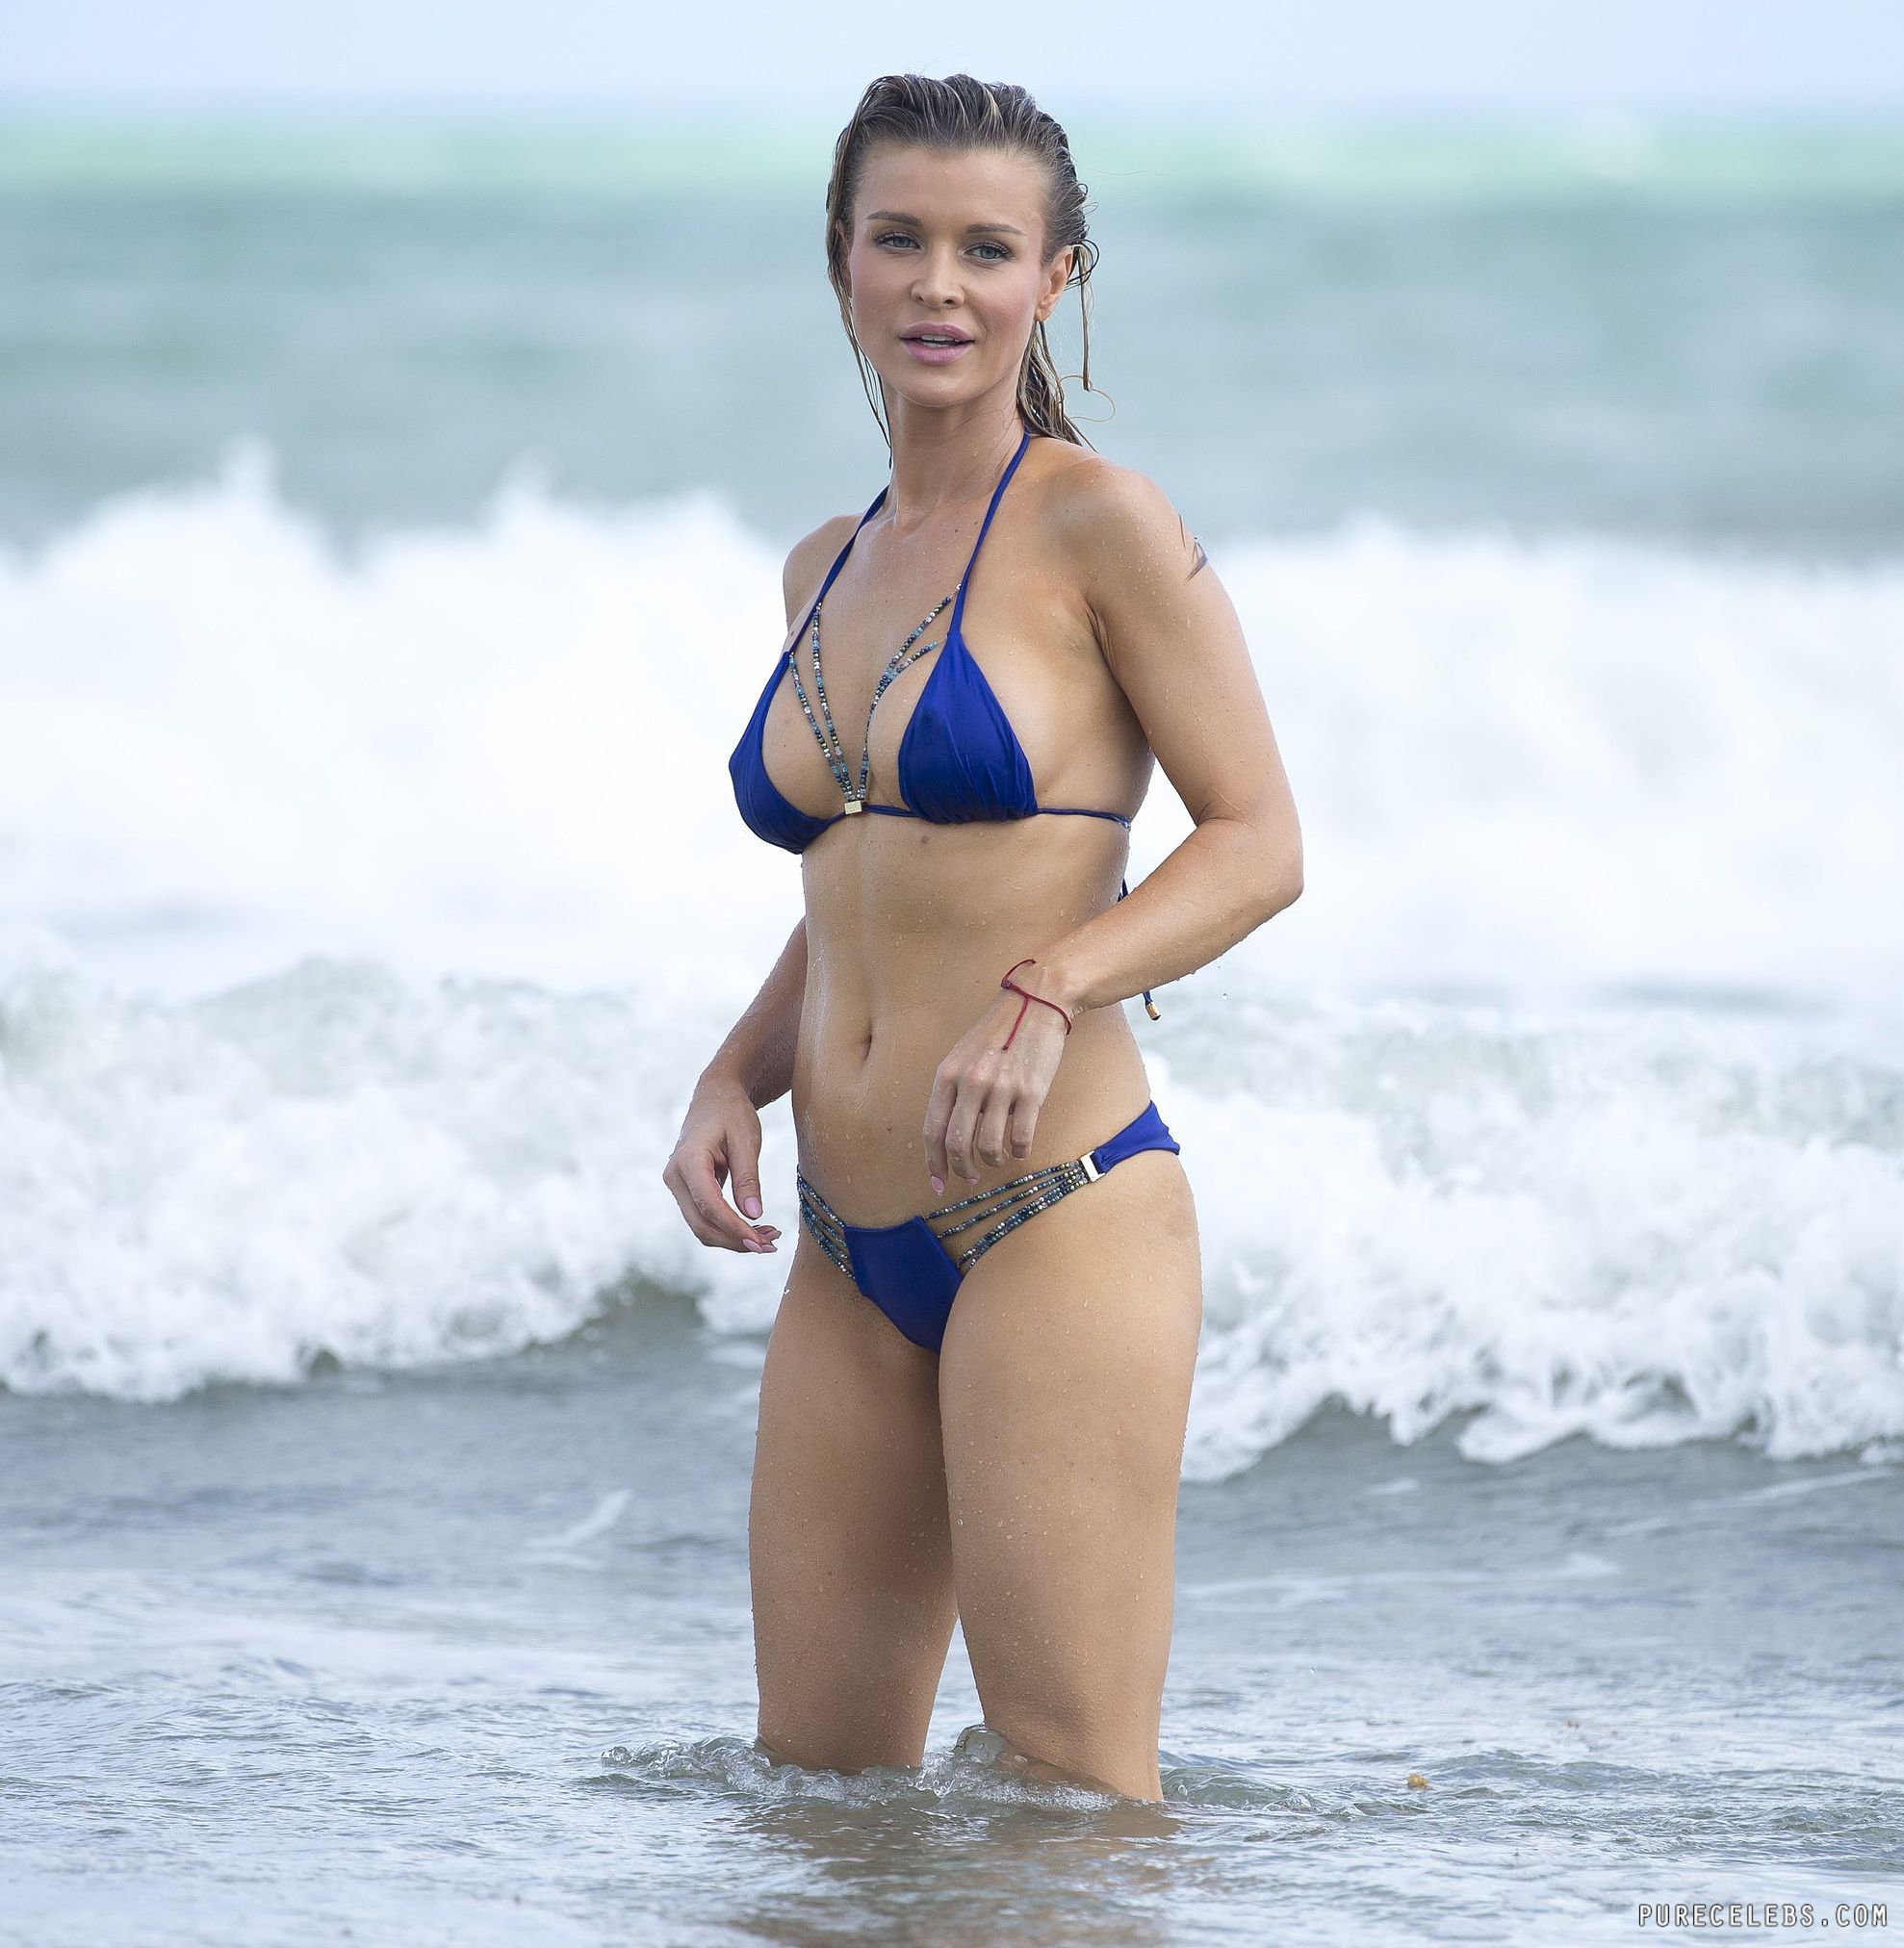 Joanna Krupa Paparazzi Bikini Ass Photos And Fully Nude